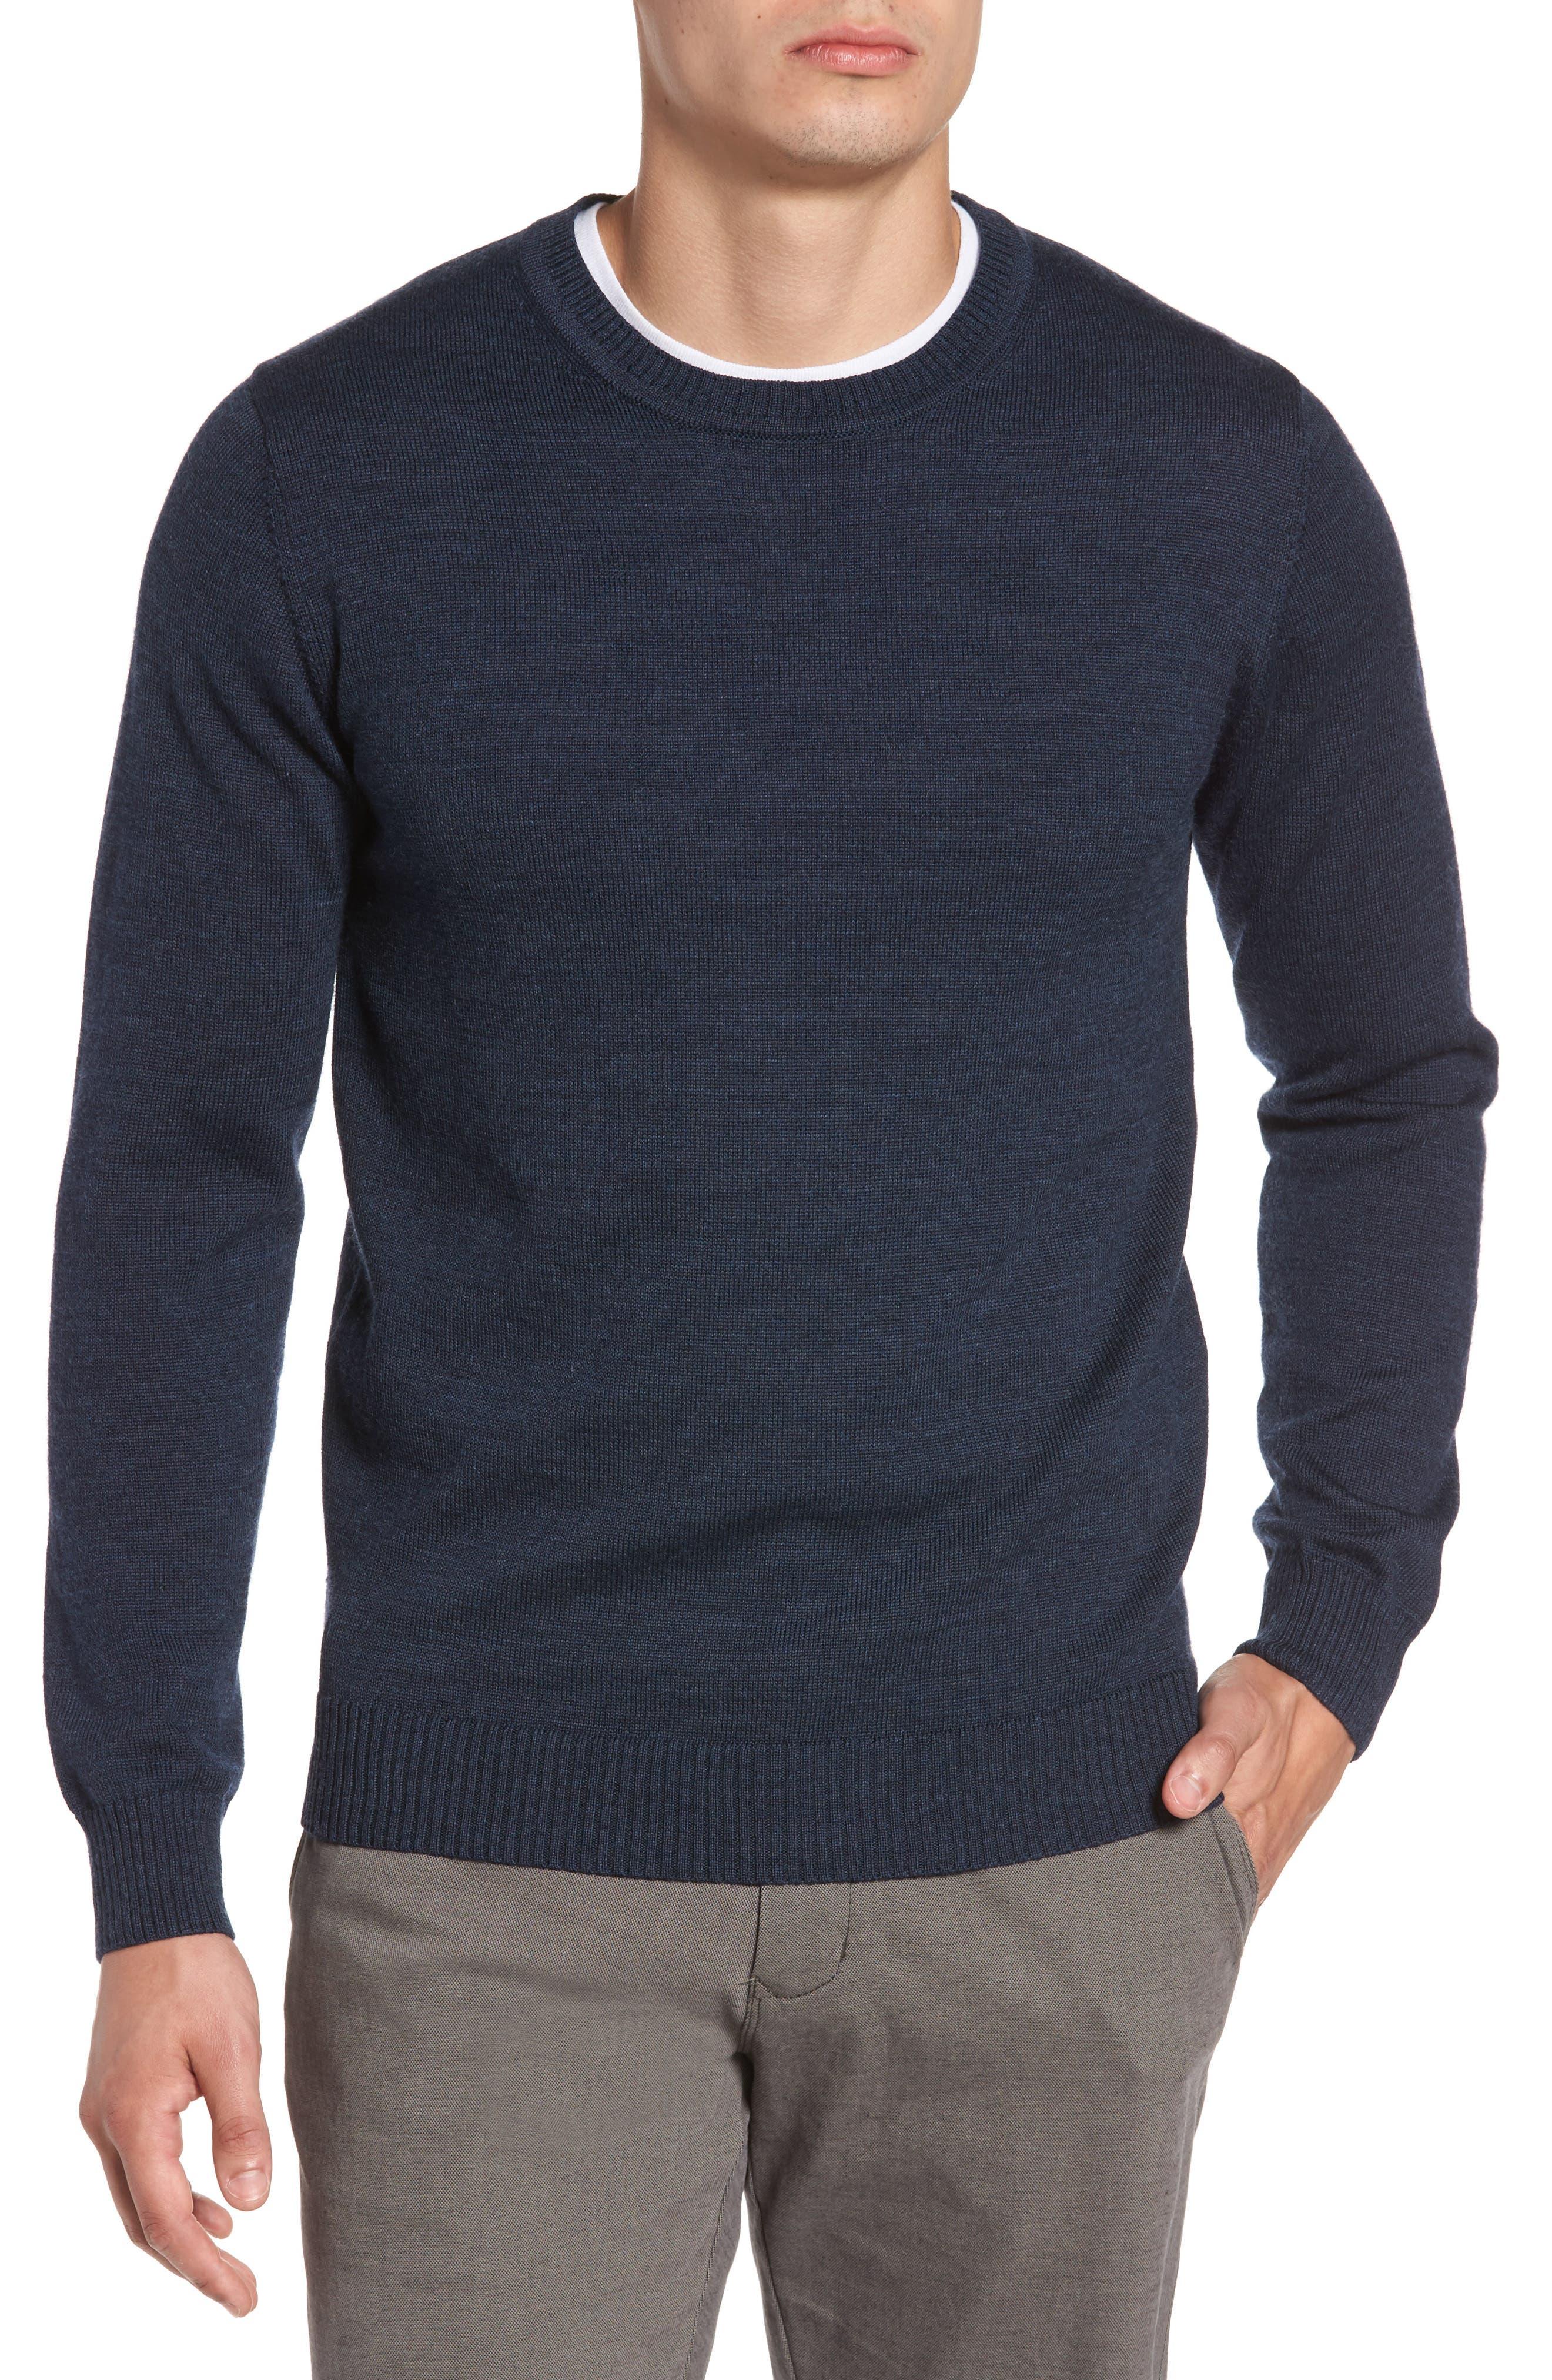 Alternate Image 1 Selected - Rodd & Gunn Bannockburn Mélange Merino Wool Sweater